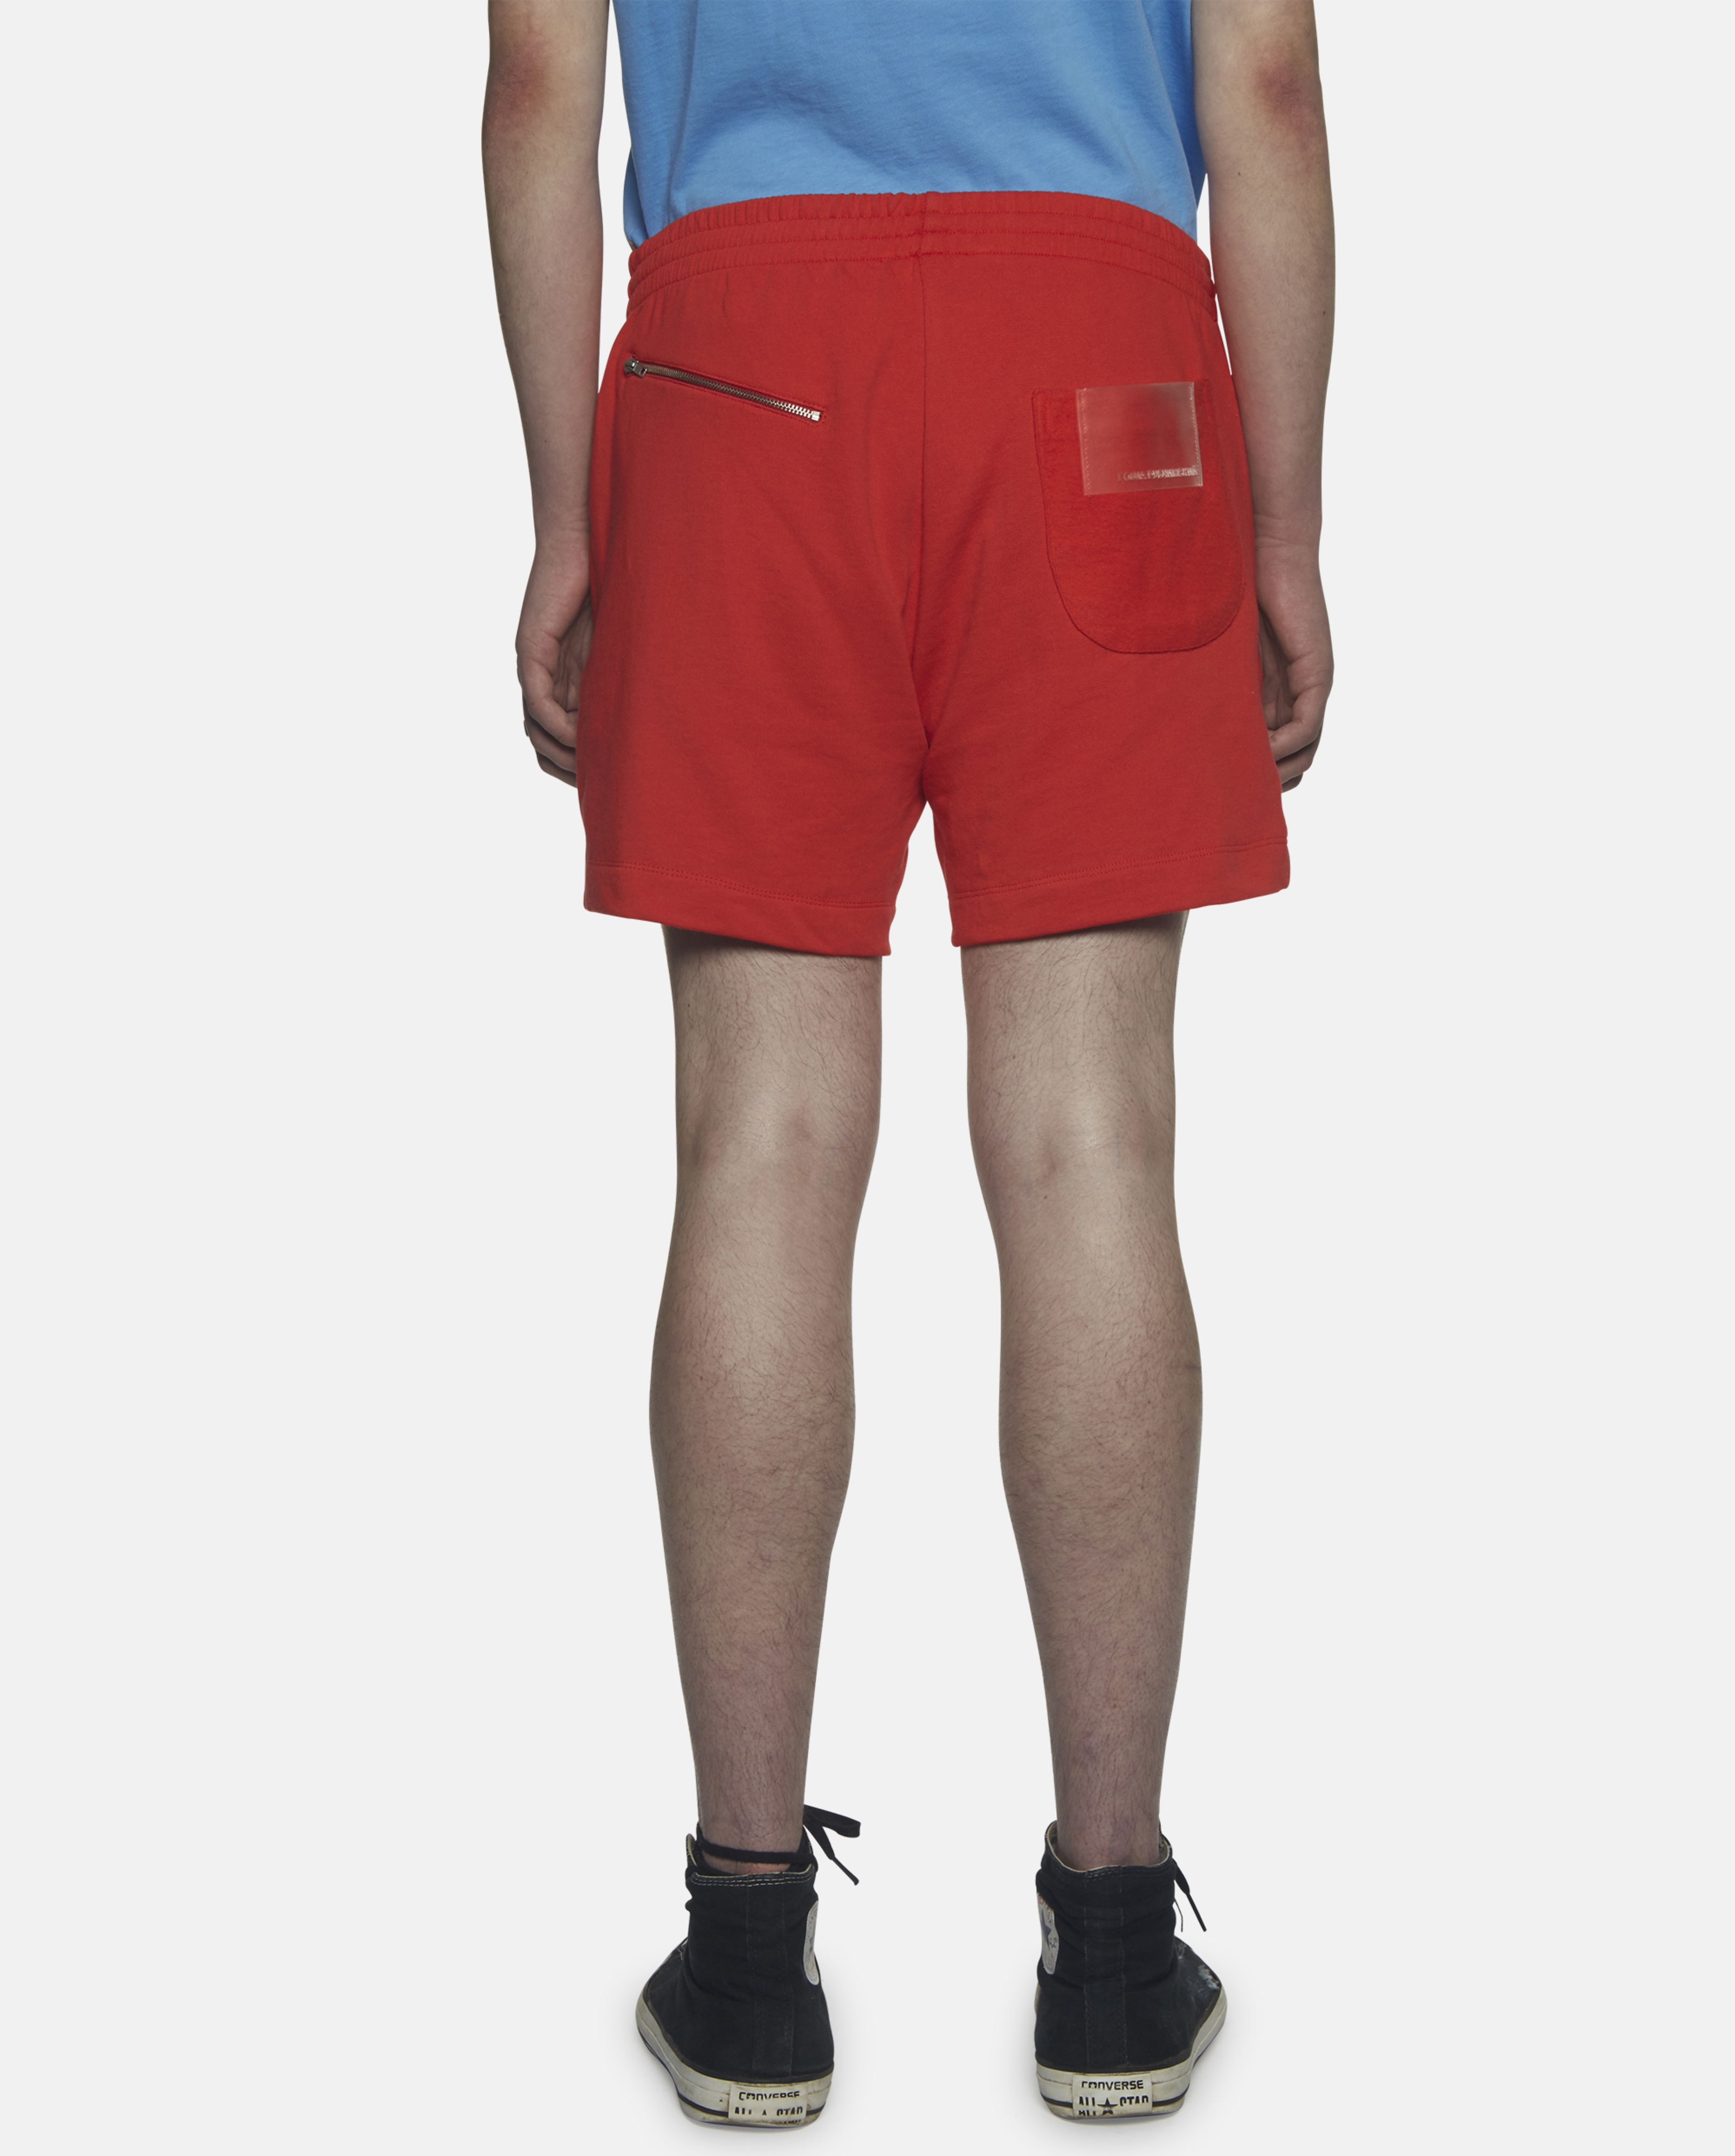 Gosha rubchinskiy Red Cotton-jersey Shorts in Orange | Lyst